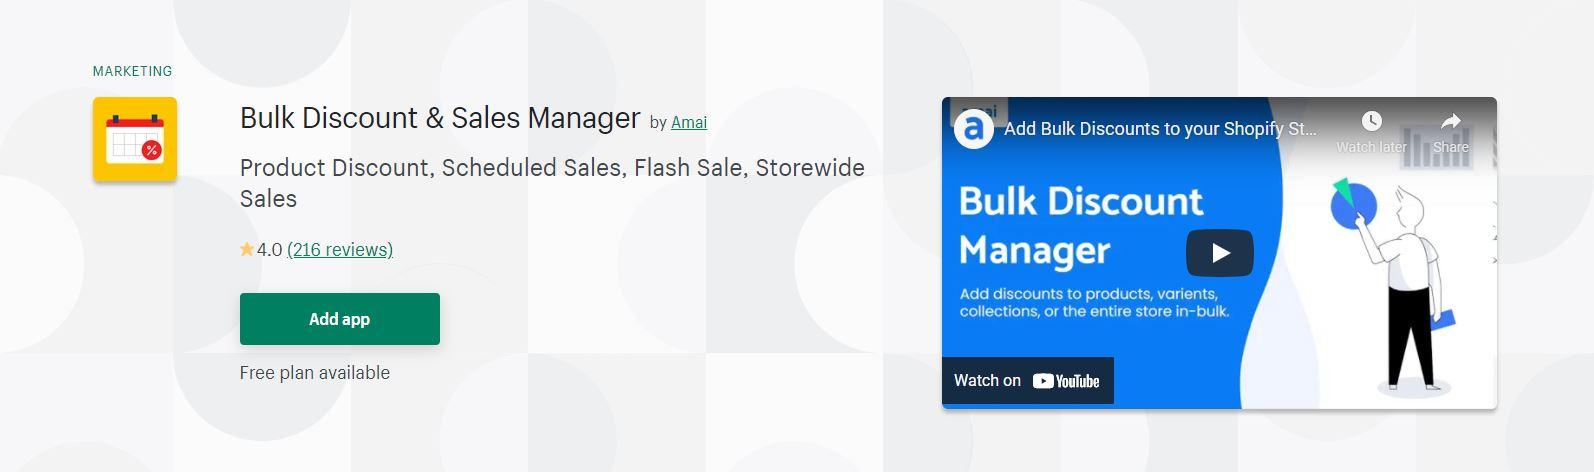 Bulk Discount & Sales Manager